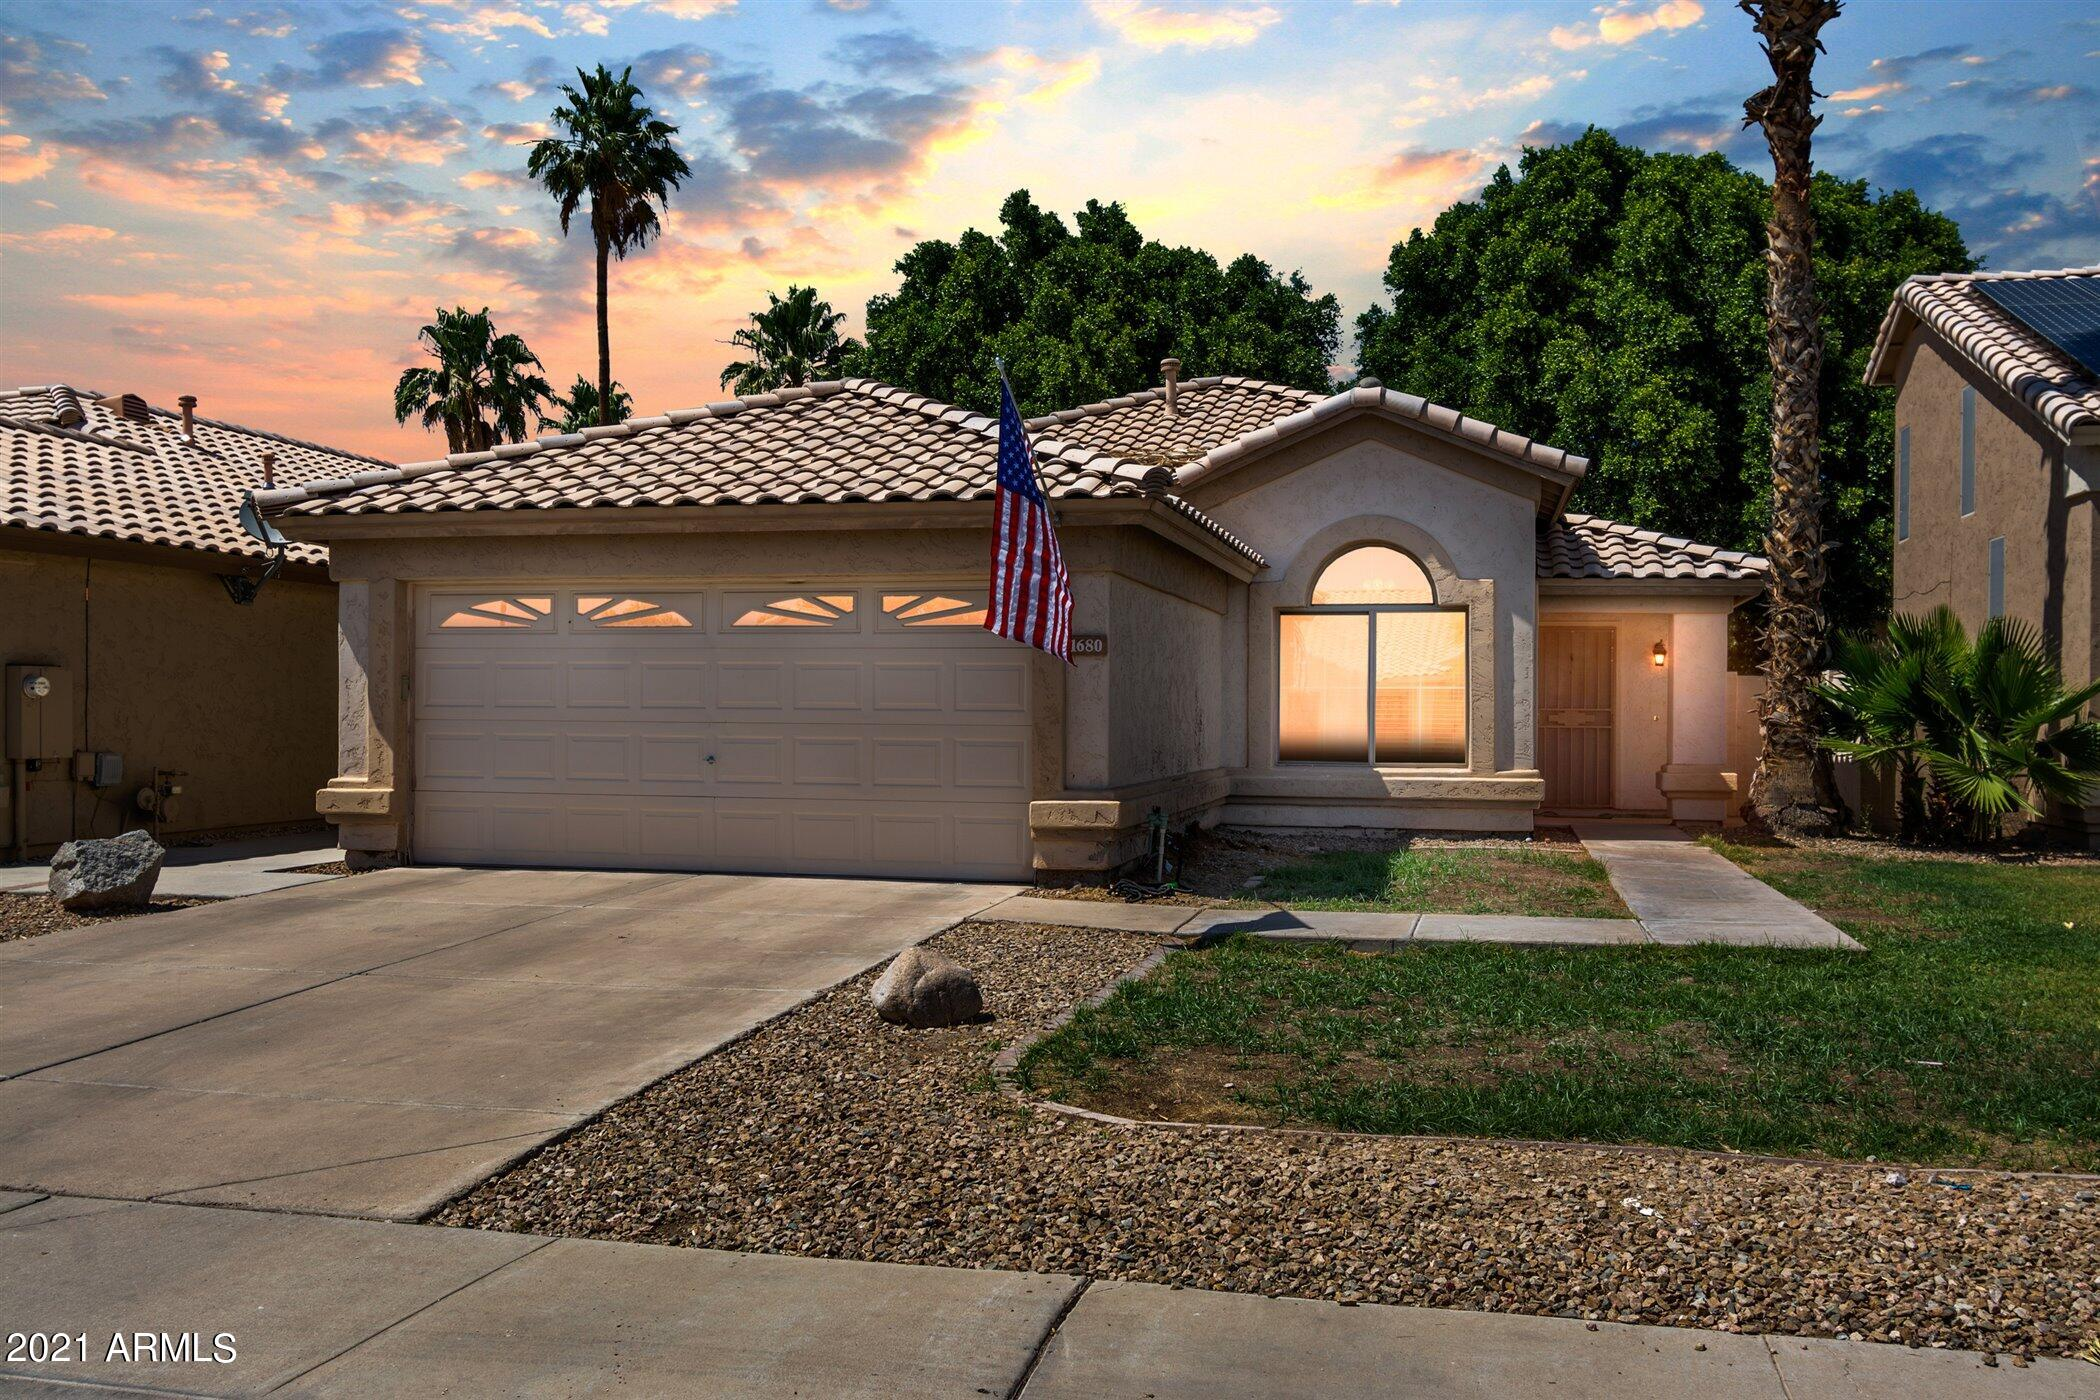 1680 Barbarita Avenue, Gilbert, Arizona 85233, 3 Bedrooms Bedrooms, ,2 BathroomsBathrooms,Residential,For Sale,Barbarita,6241937